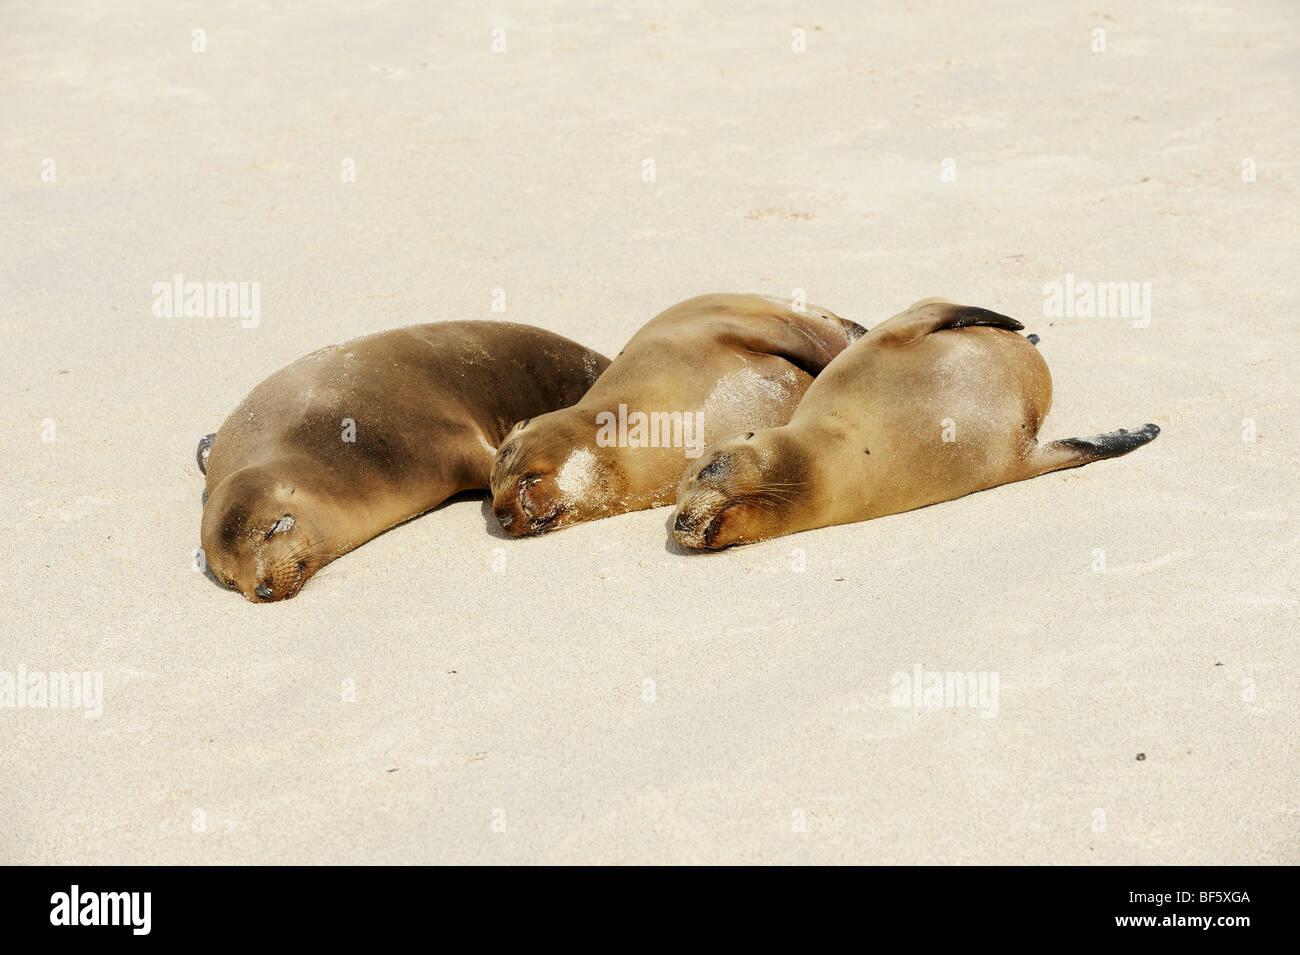 Lobo de mar de Galápagos (Zalophus wollebaeki), adultos en playa, Espanola Isla Galápagos, Ecuador, Sudamérica Foto de stock